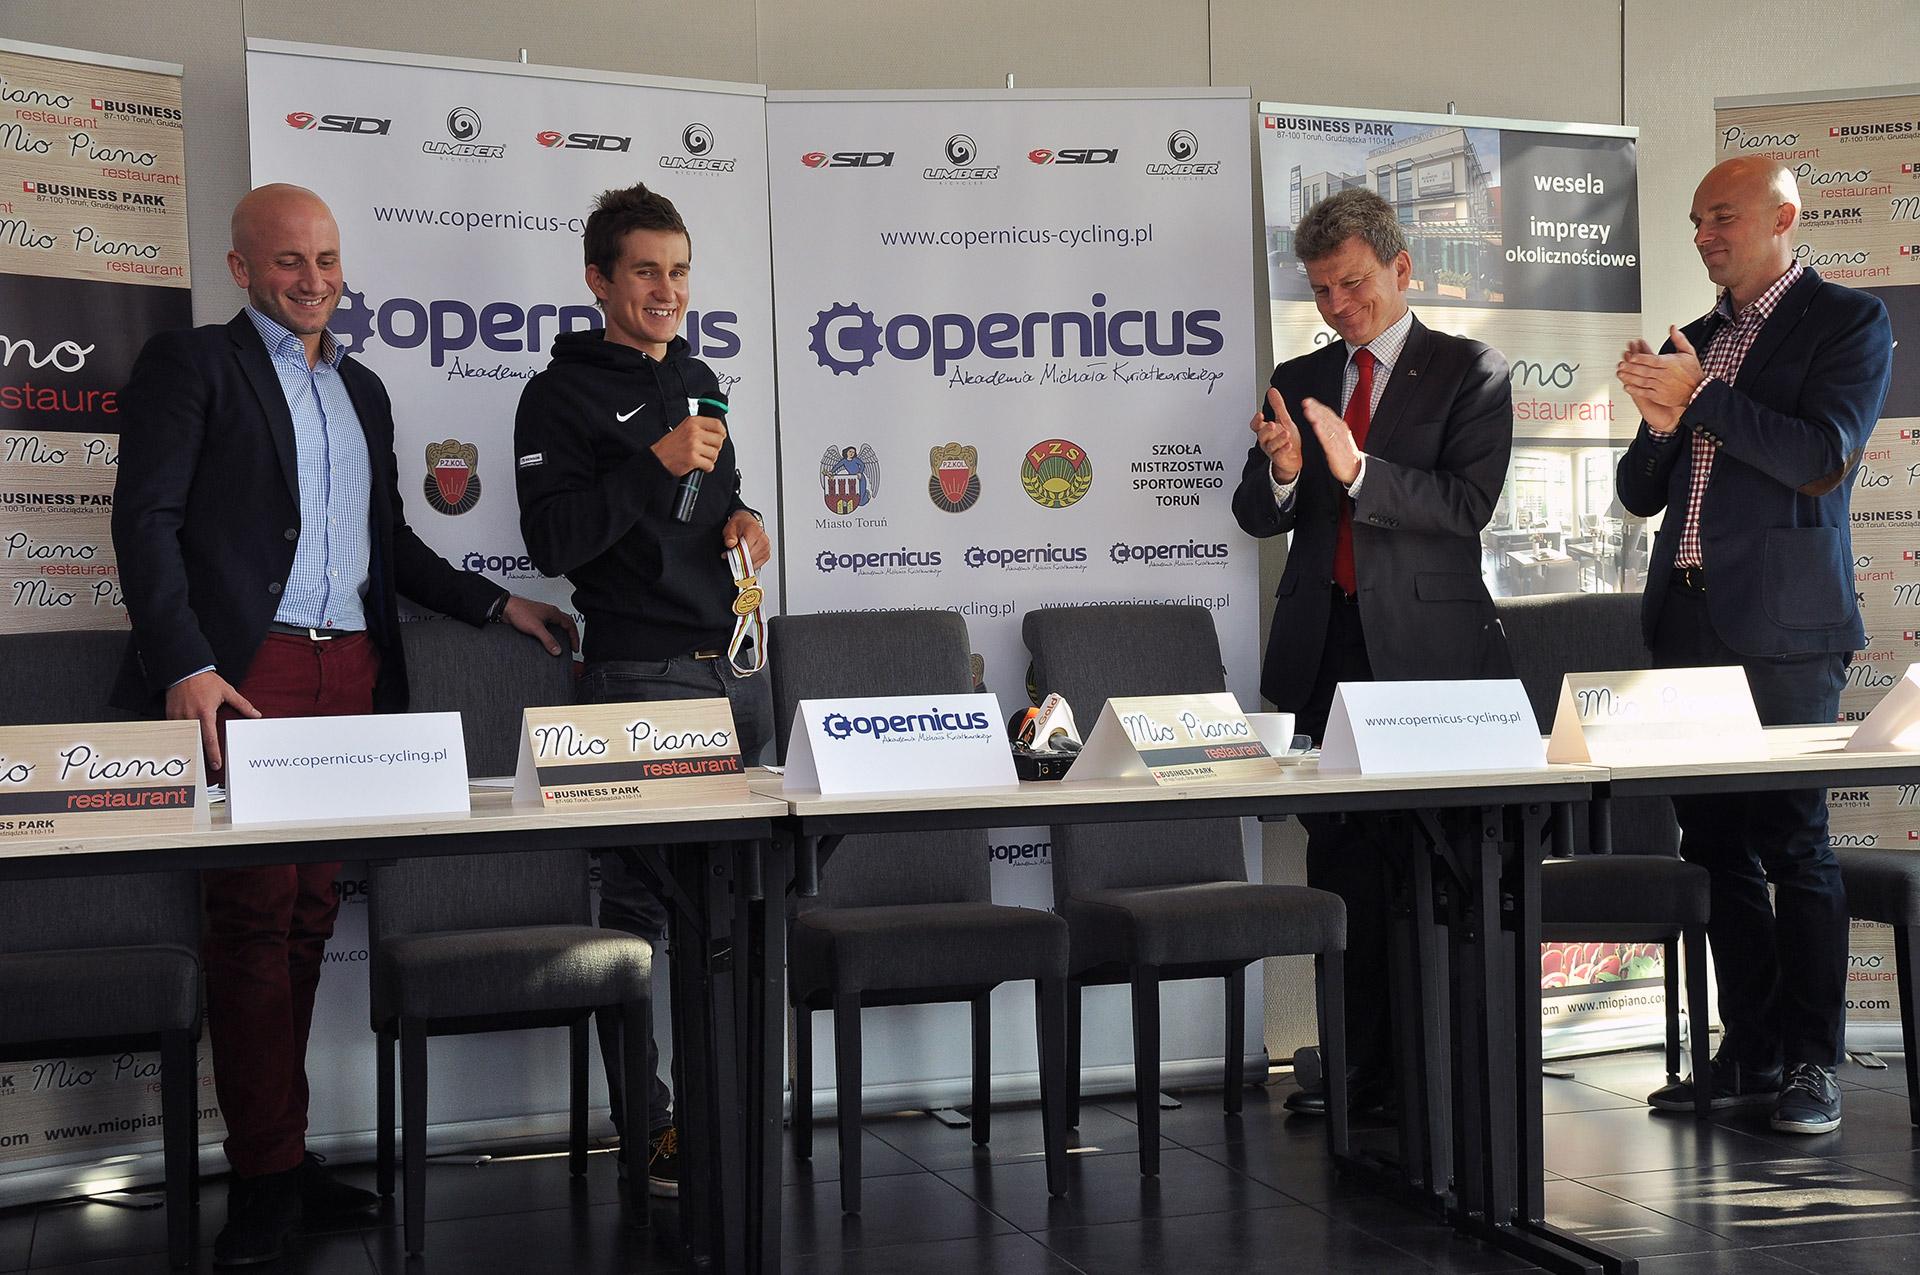 Inauguracja Copernicus, Mio Piano, 09.10.2013